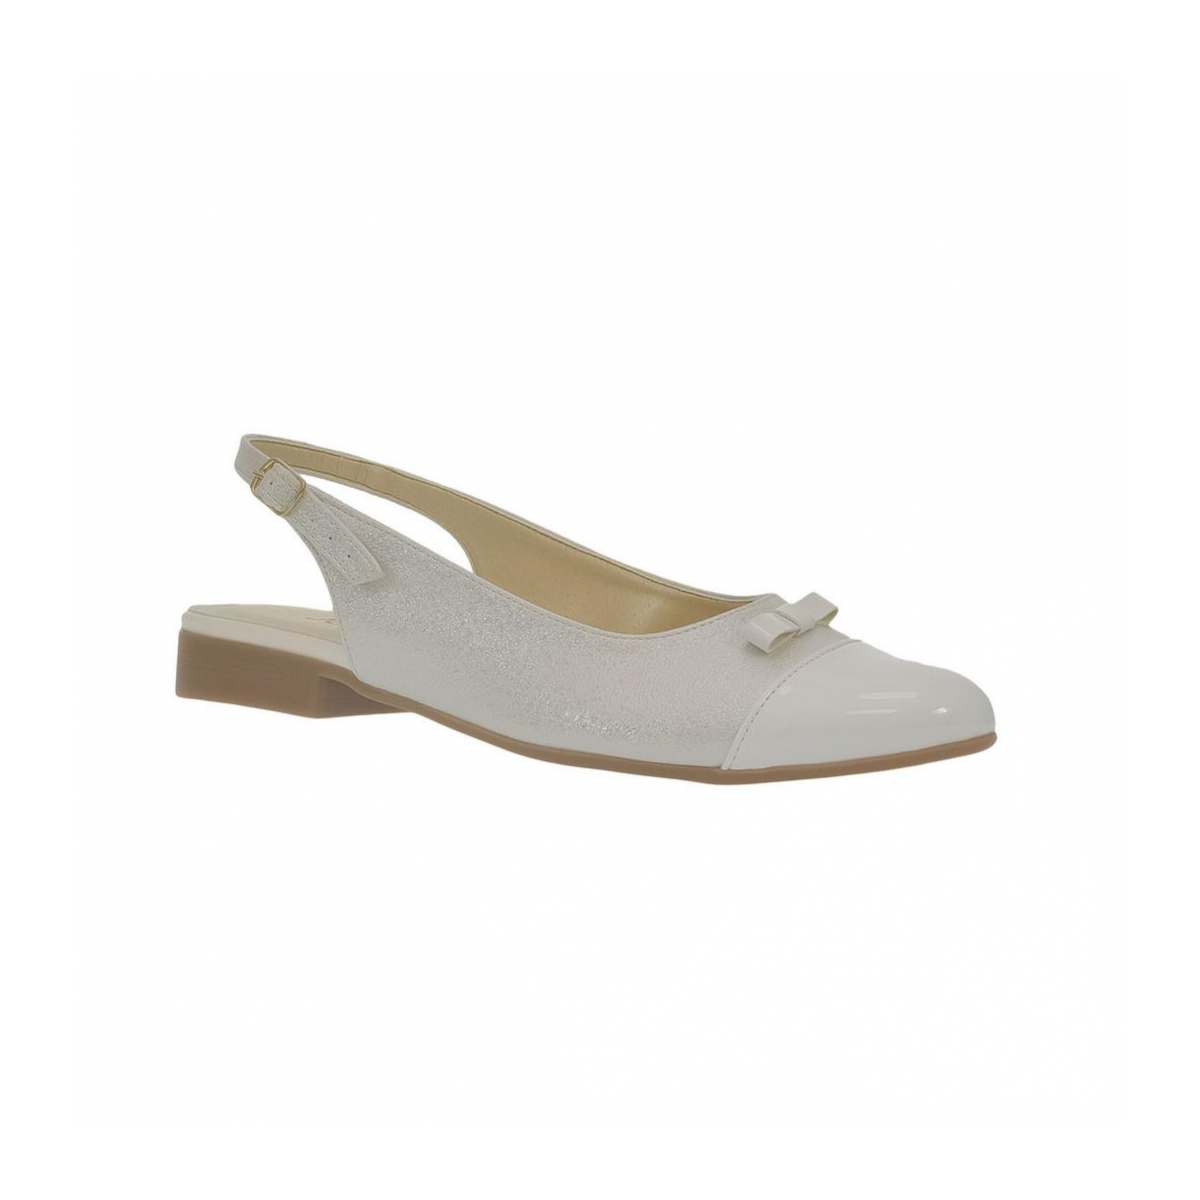 6df302d79ecb Dámske biele sandále EVELINE - 4